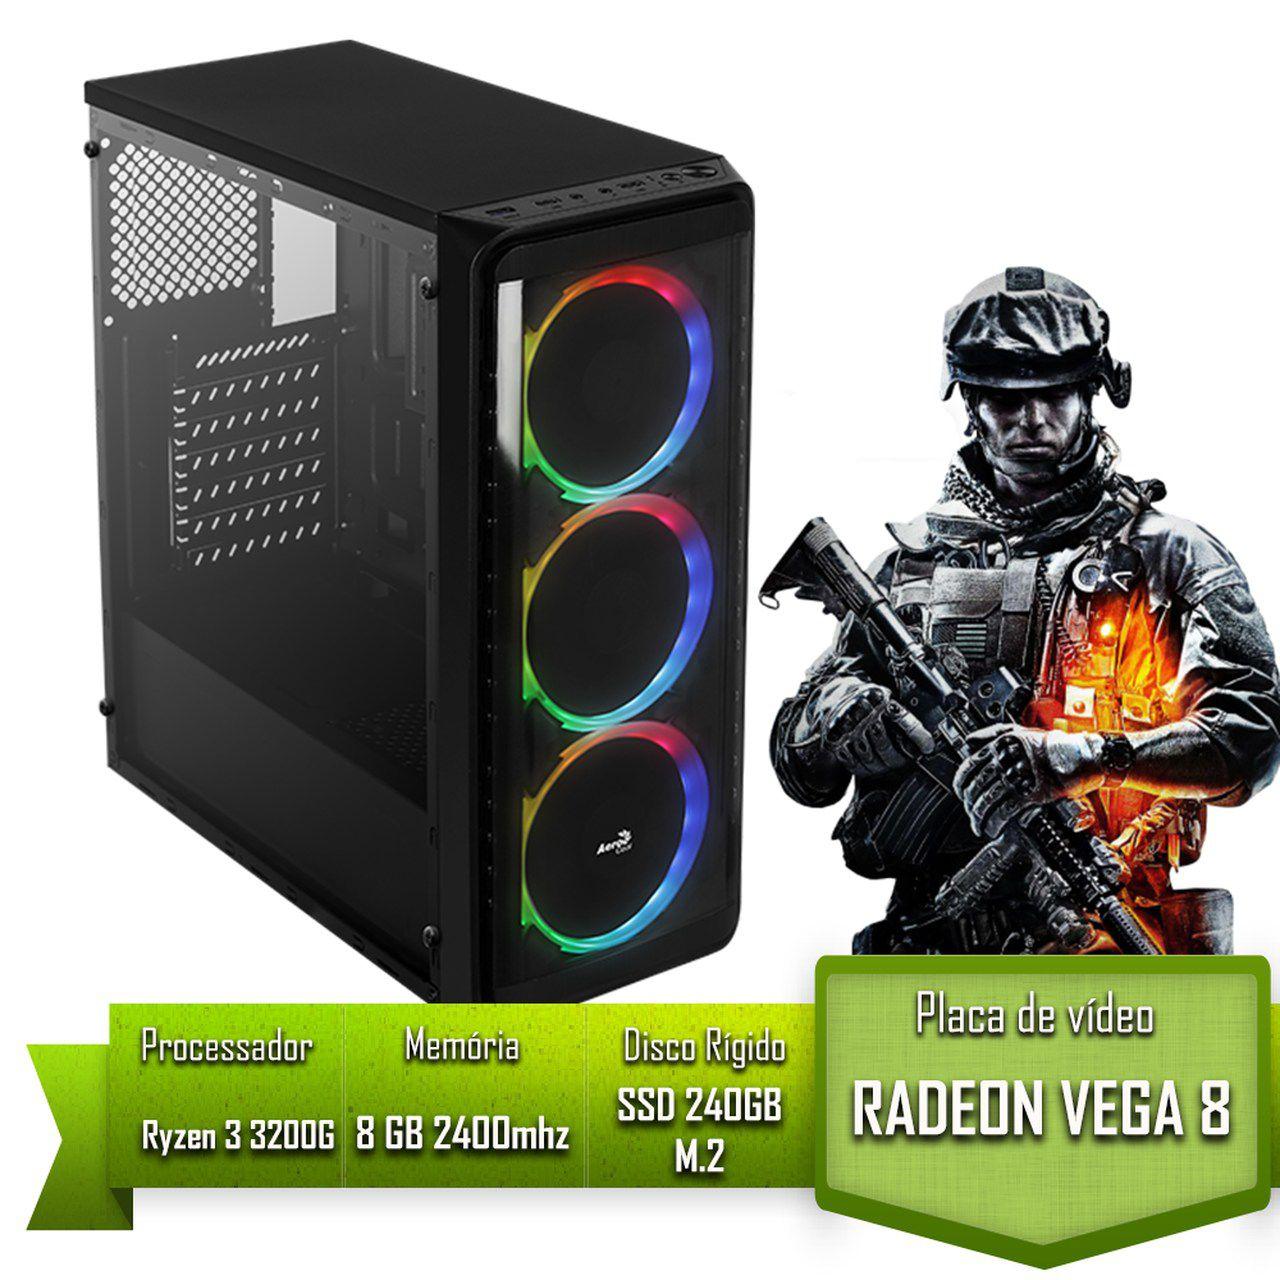 PC GAMER ALLIGATOR GAMING AMD RYZEN 3 3200G / 8GB 2400MHZ /SSD 240GB M.2 / VEGA 8